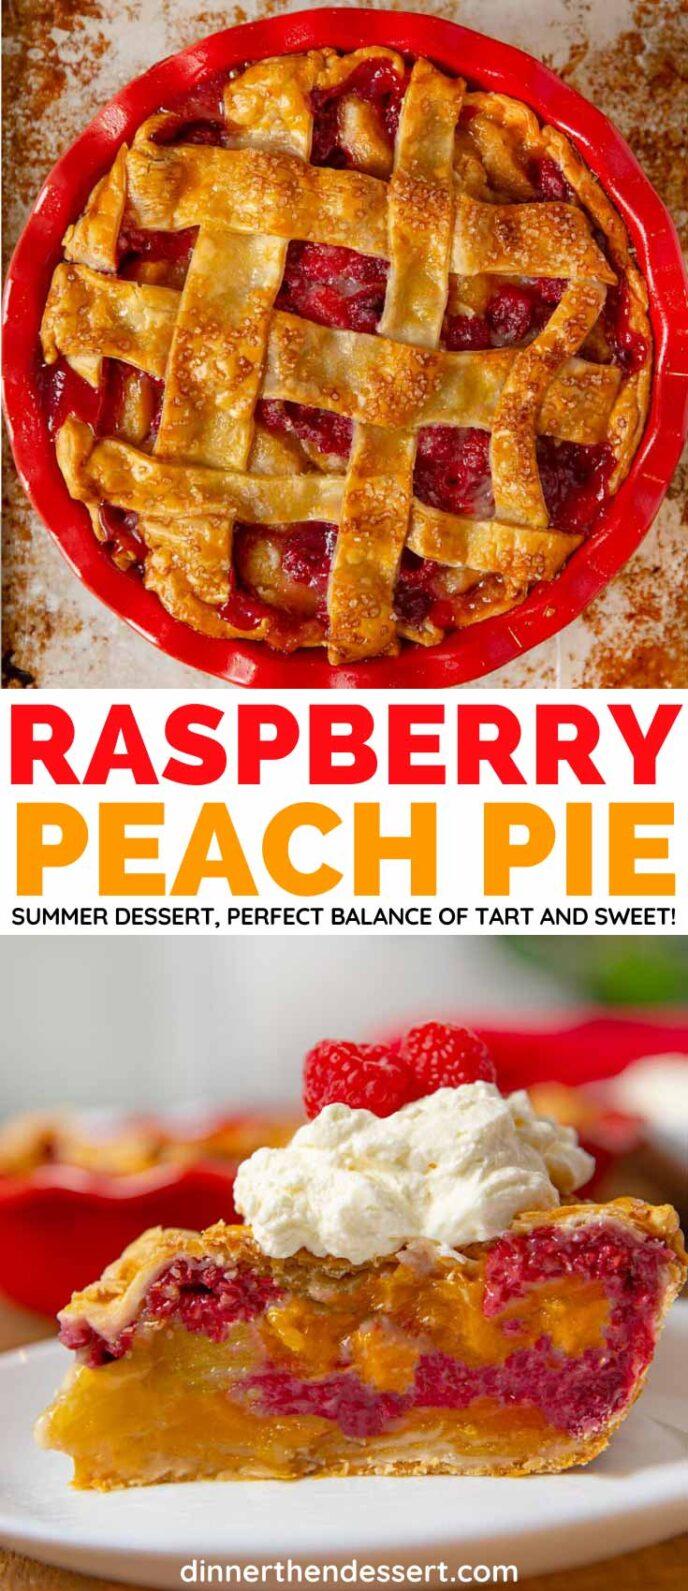 Raspberry Peach Pie collage